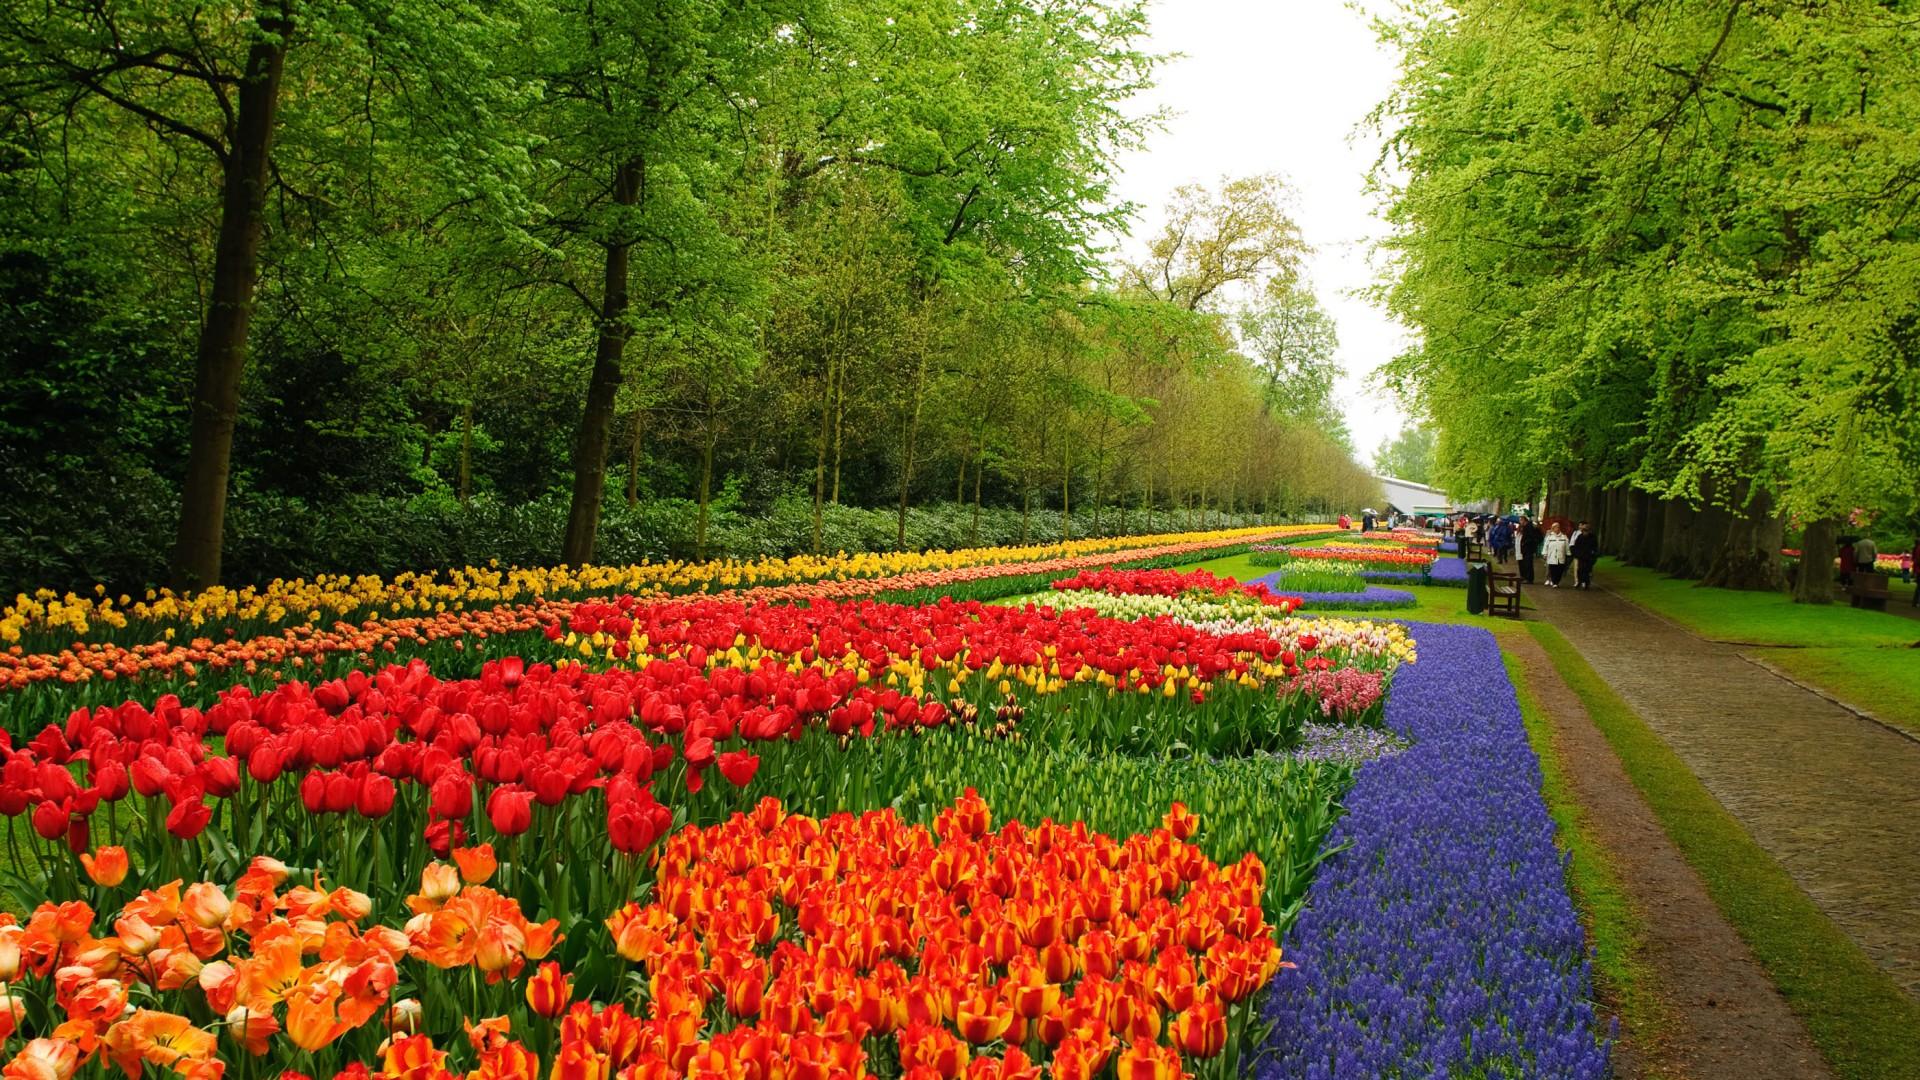 Flower Garden Wallpapers Hd Desktop And Mobile Backgrounds